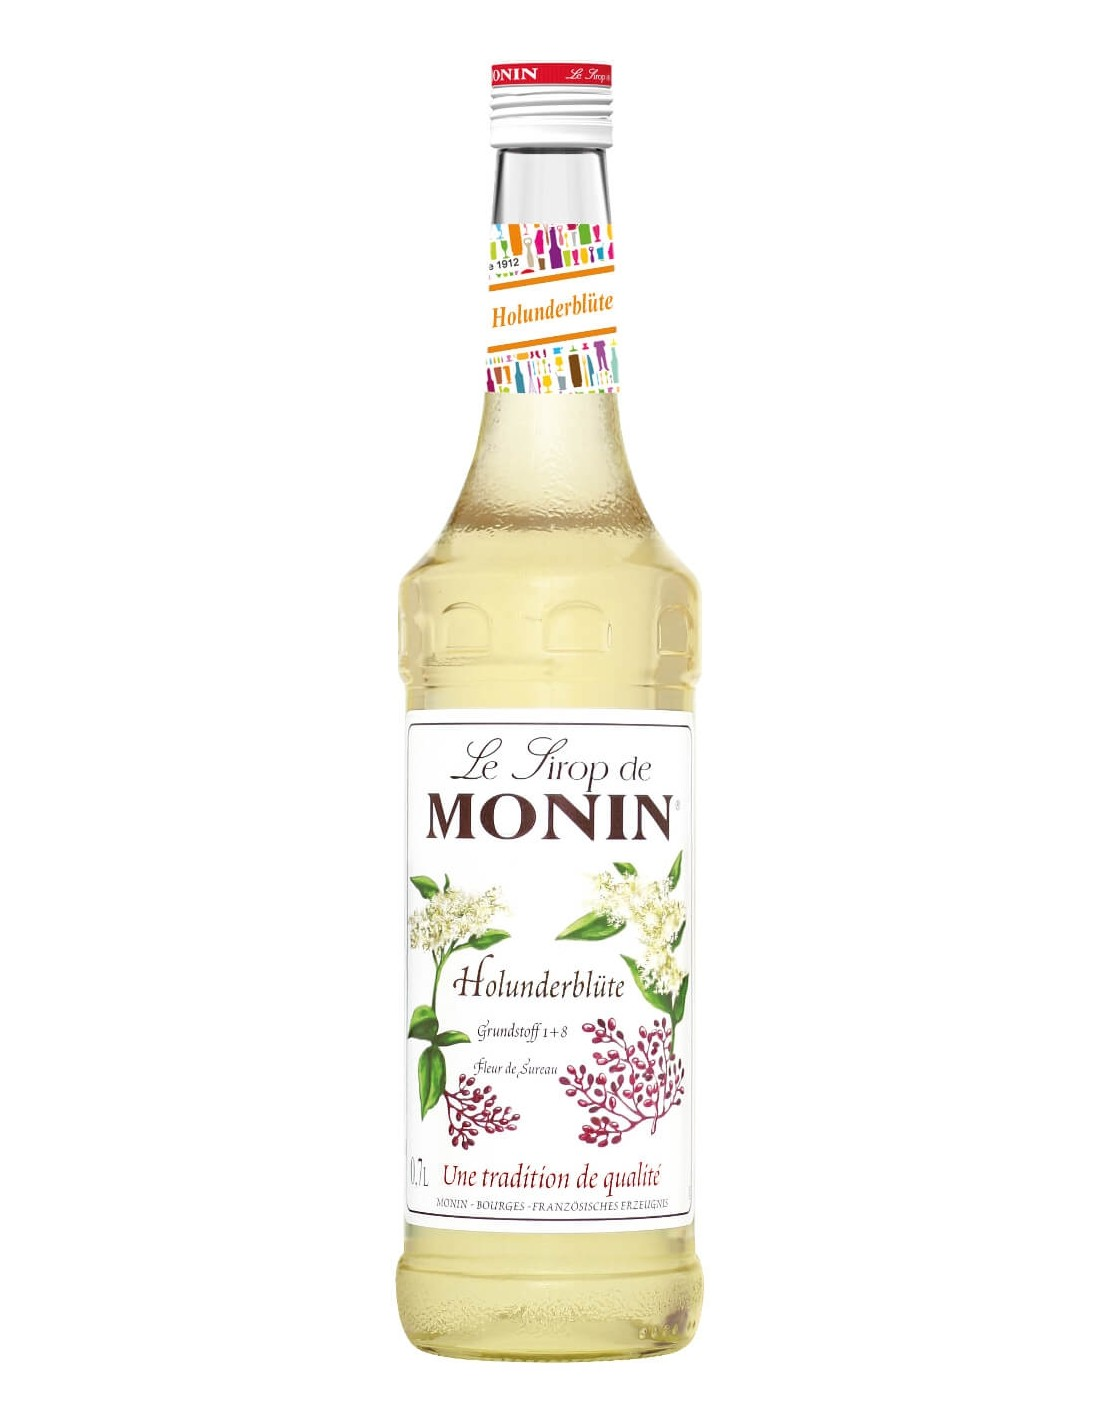 Sirop cocktail Monin Flori de Soc Monin Holunderblute, 0.7L, Franta